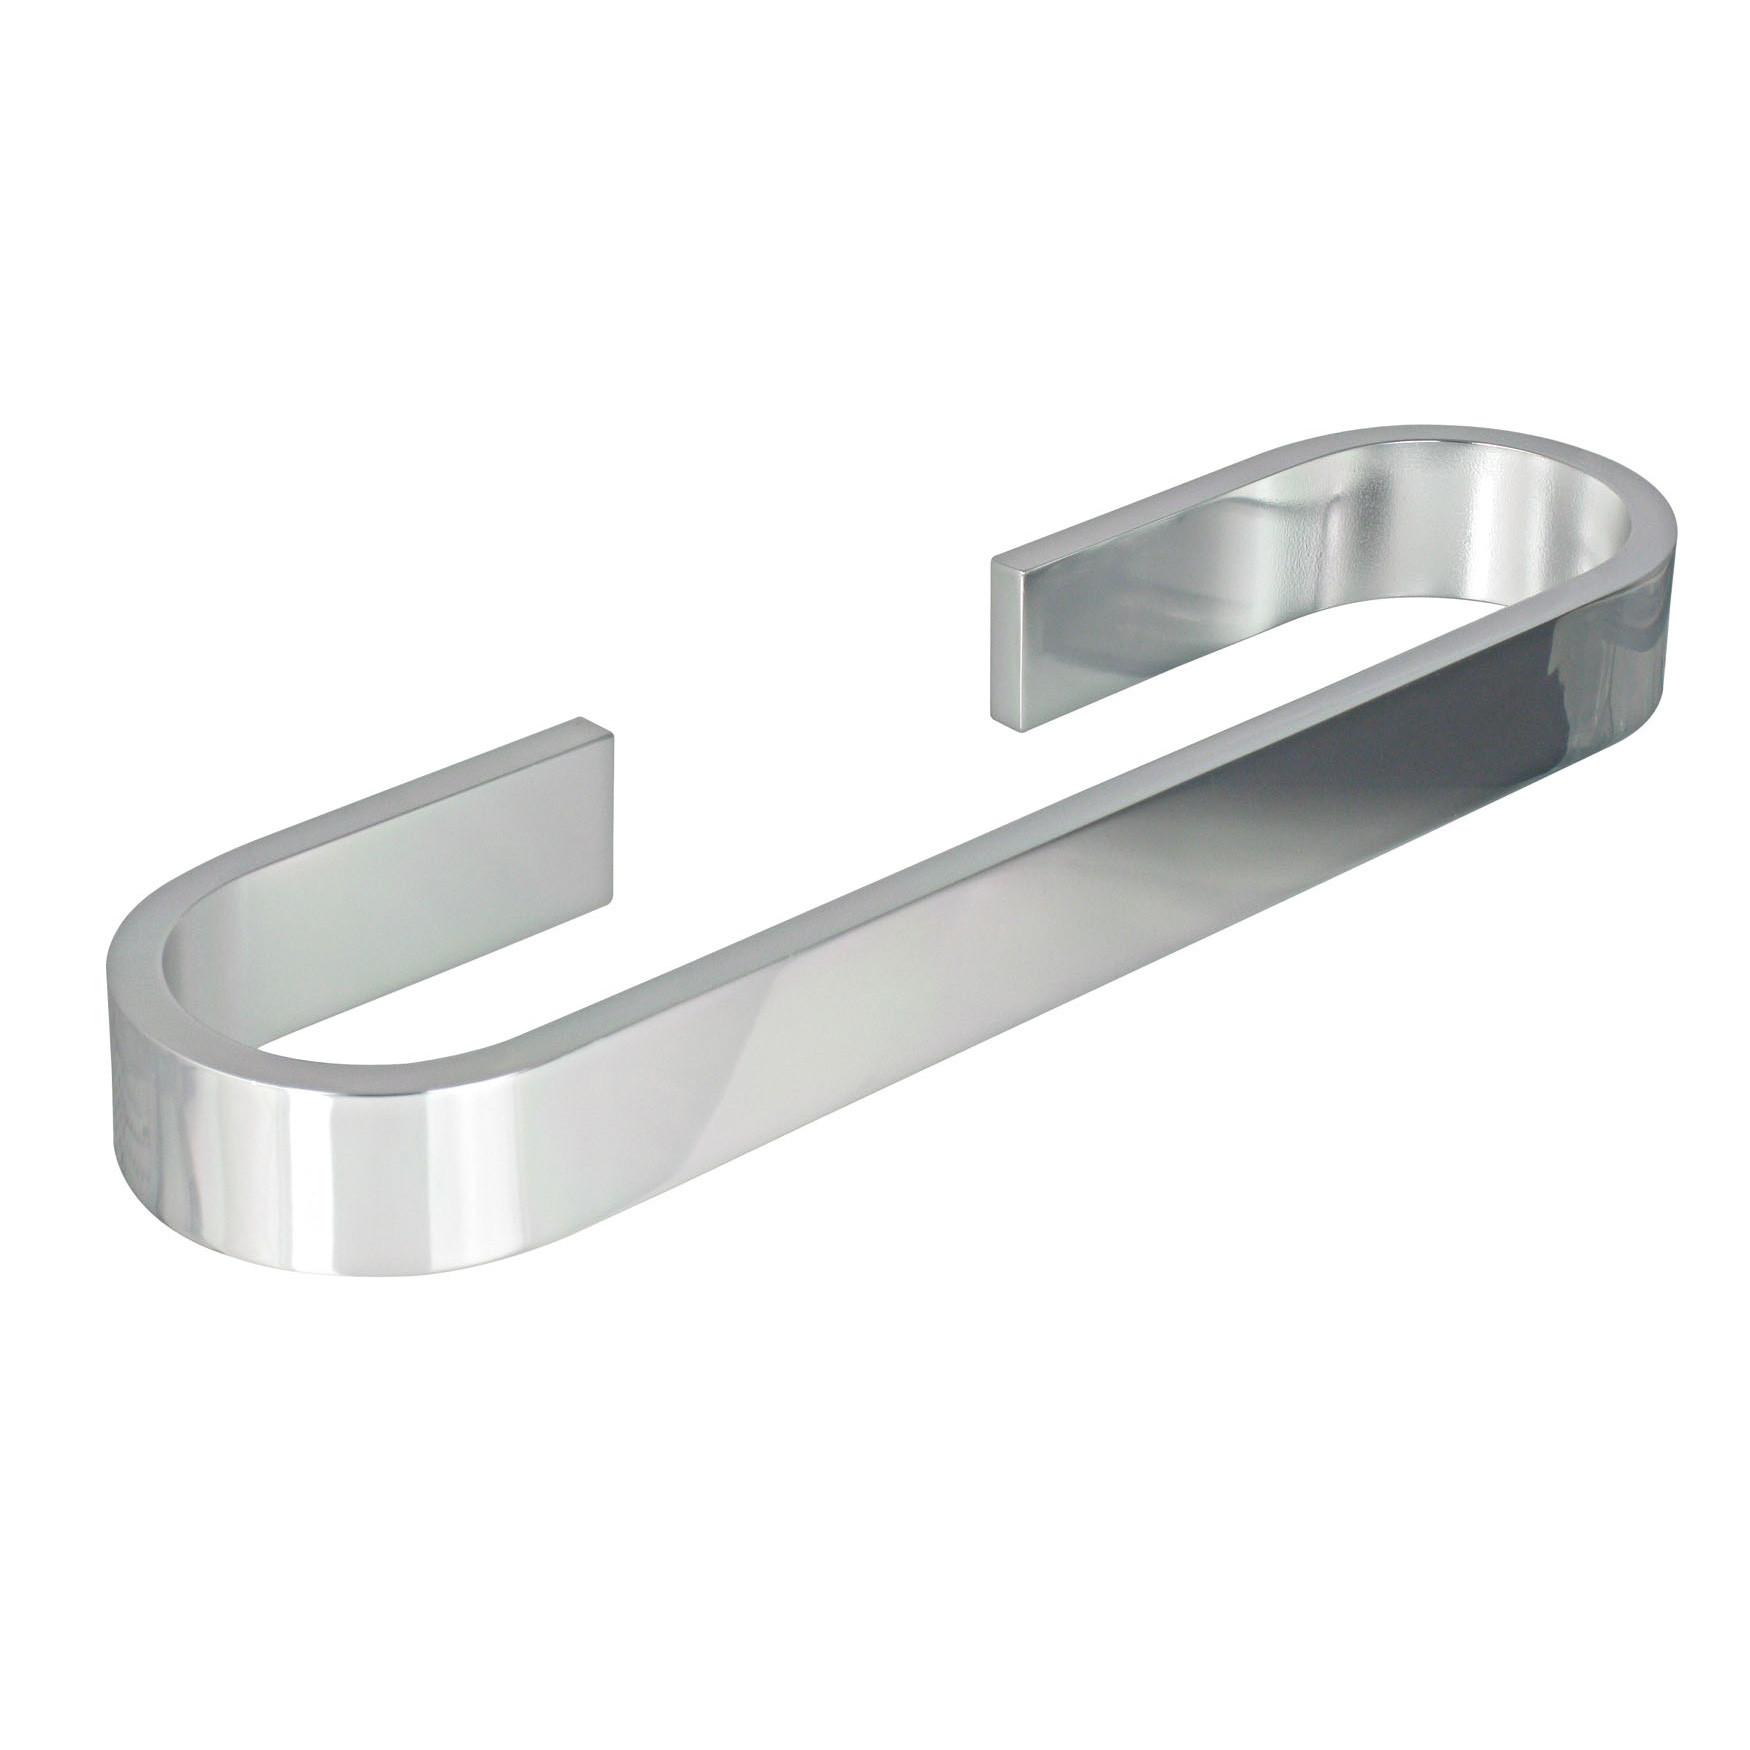 Porte serviette 32cm aluminium materia adh sif 3m - Porte serviette pour porte ...